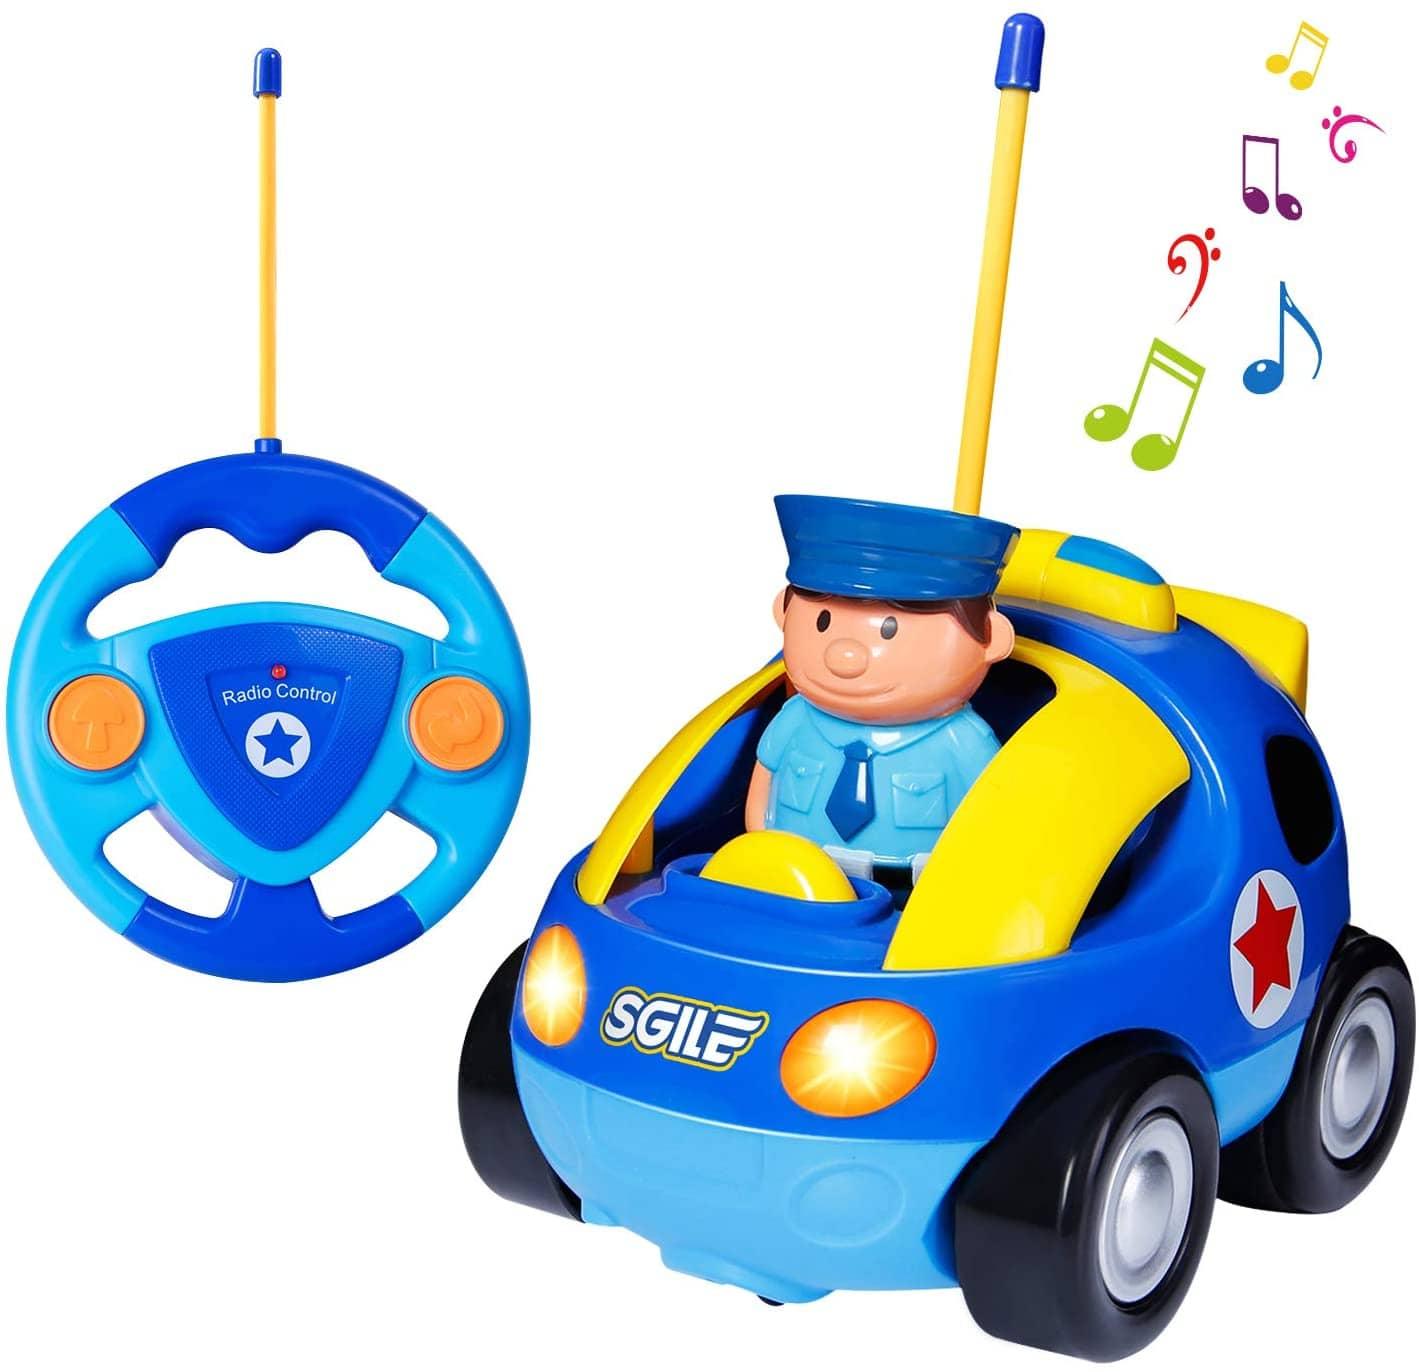 Remote Control Car - SGILE